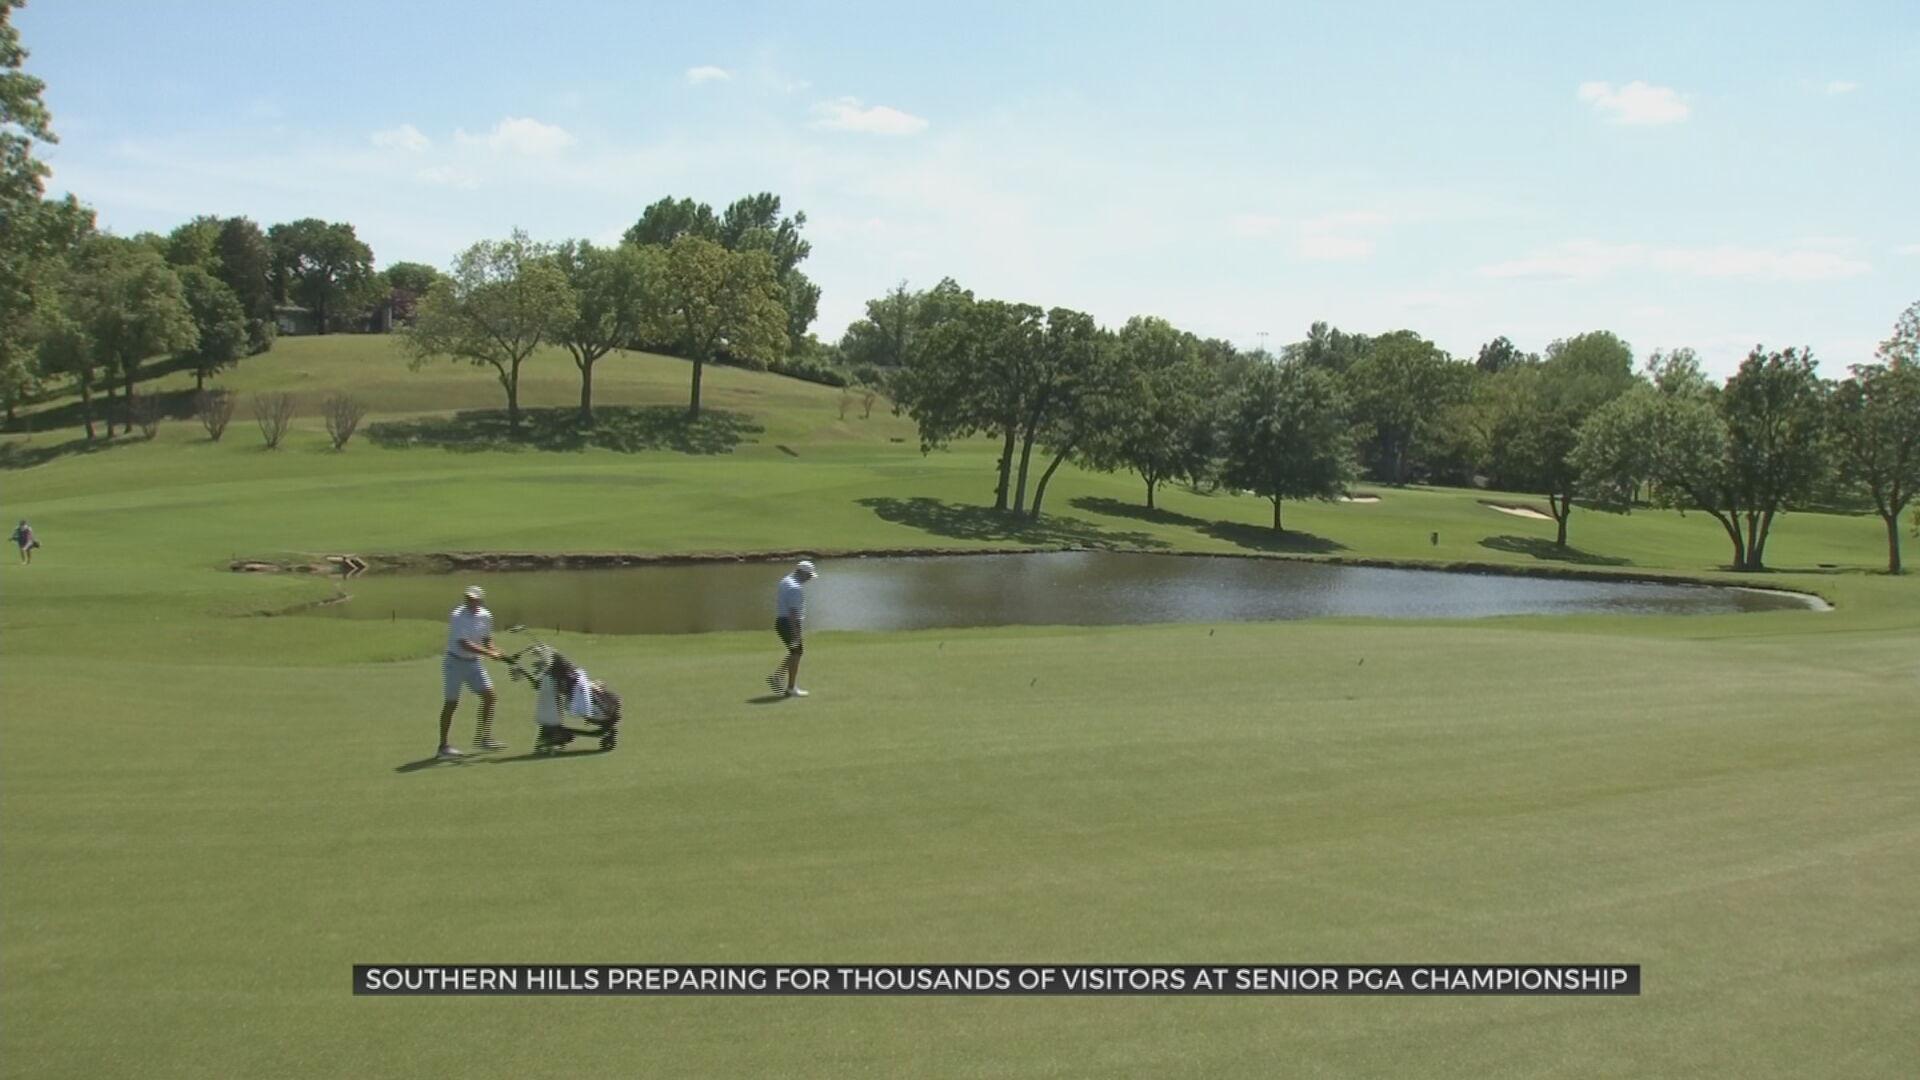 Southern Hills Preparing For Thousands Of Visitors At Senior PGA Championship